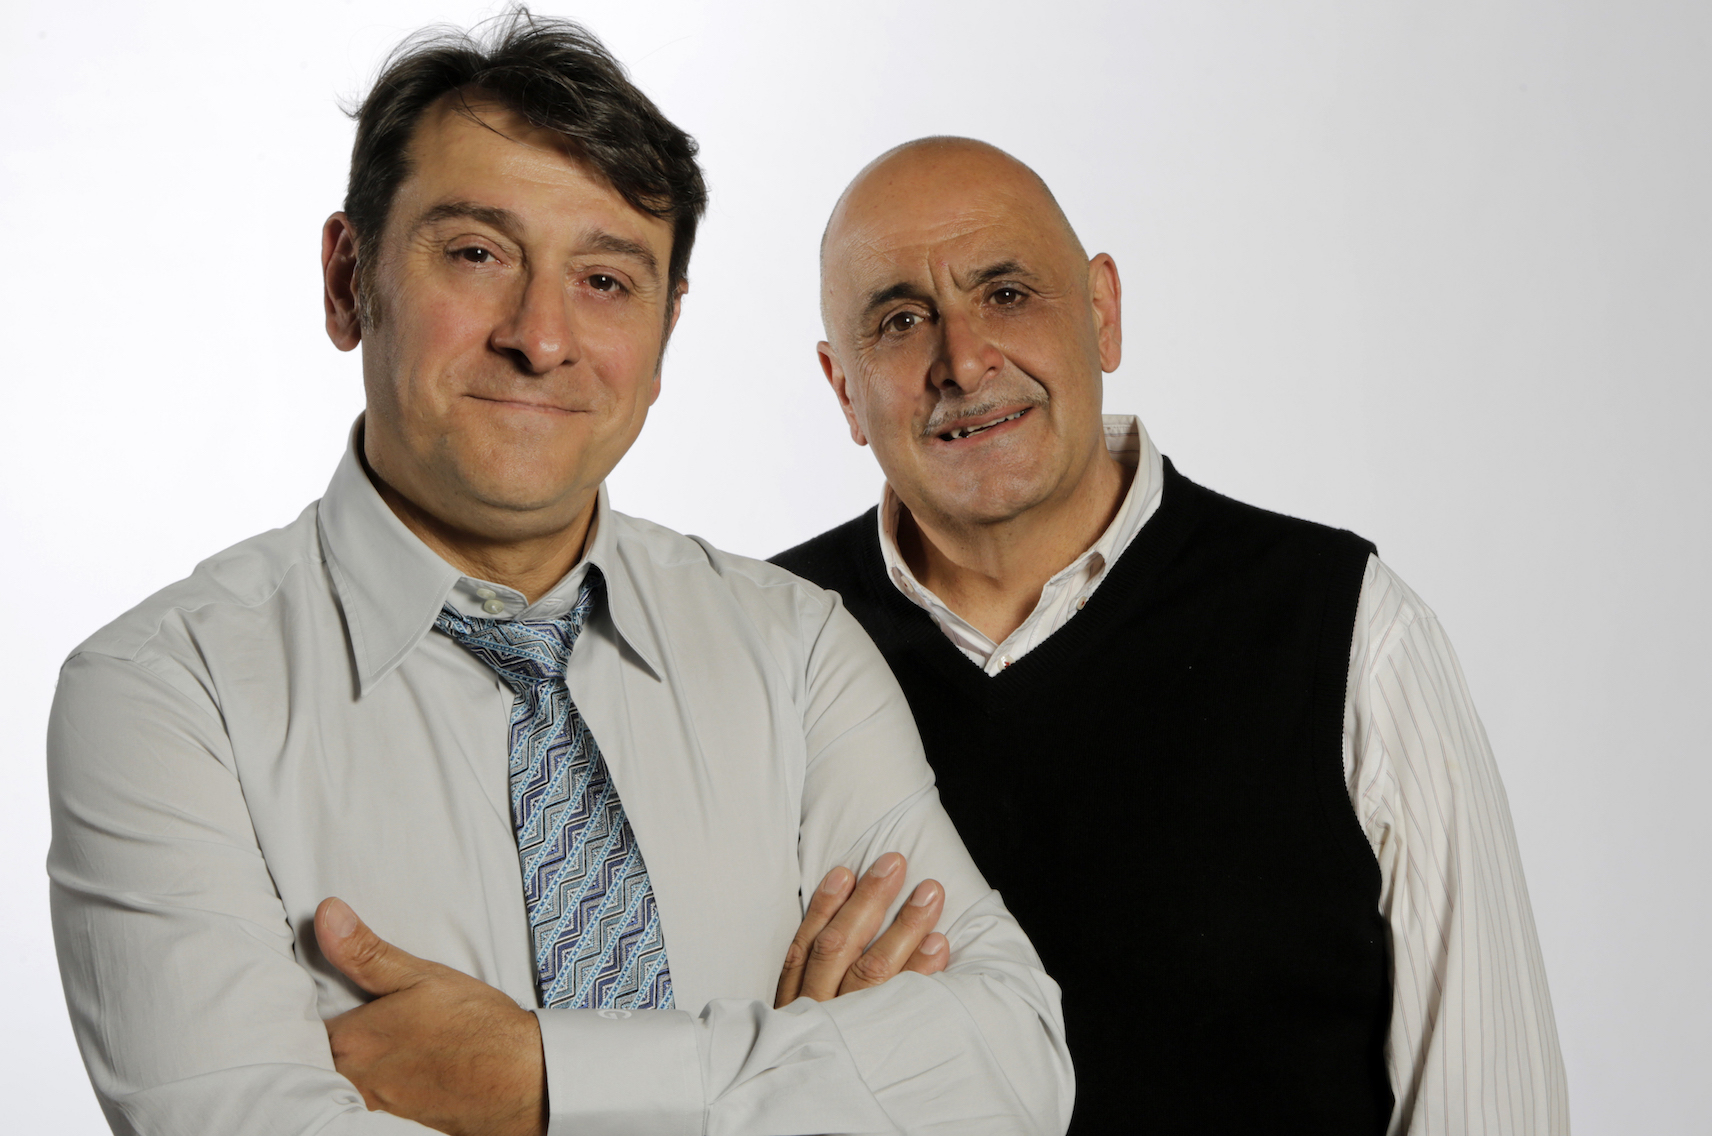 Mario Maccarone and Mario DePasquale 2016